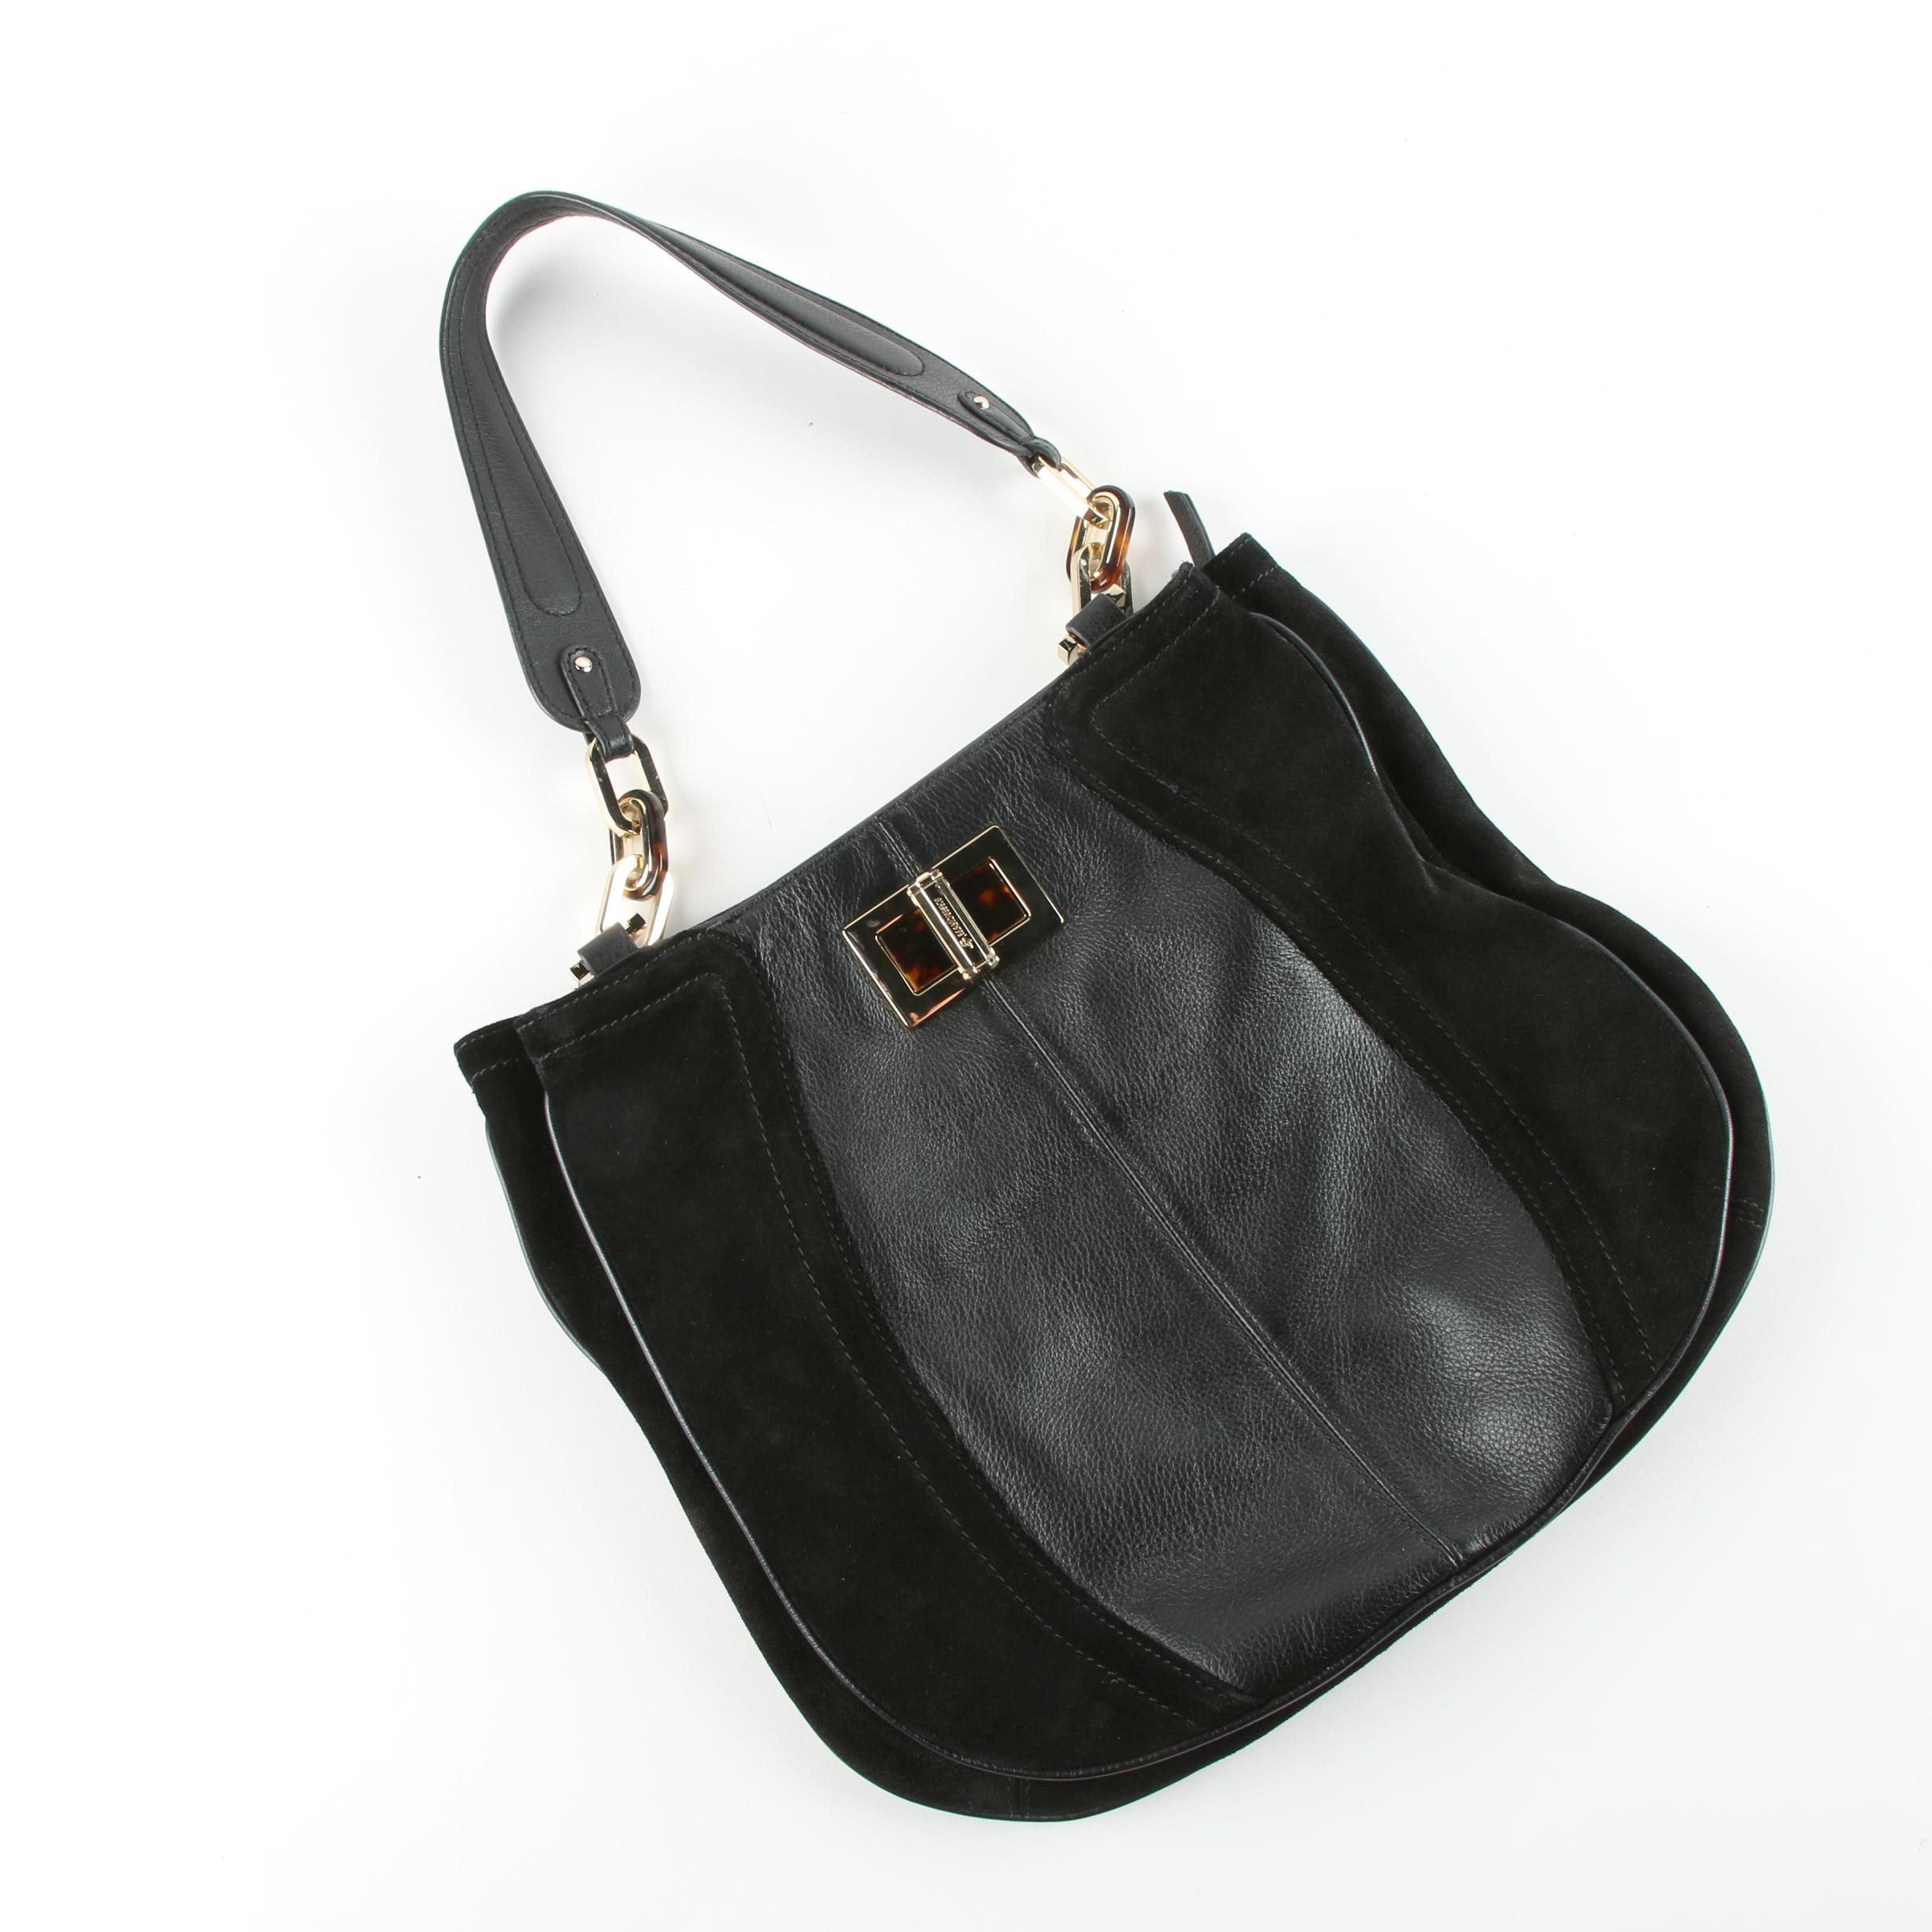 B. Makowsky Black Suede and Leather Handbag